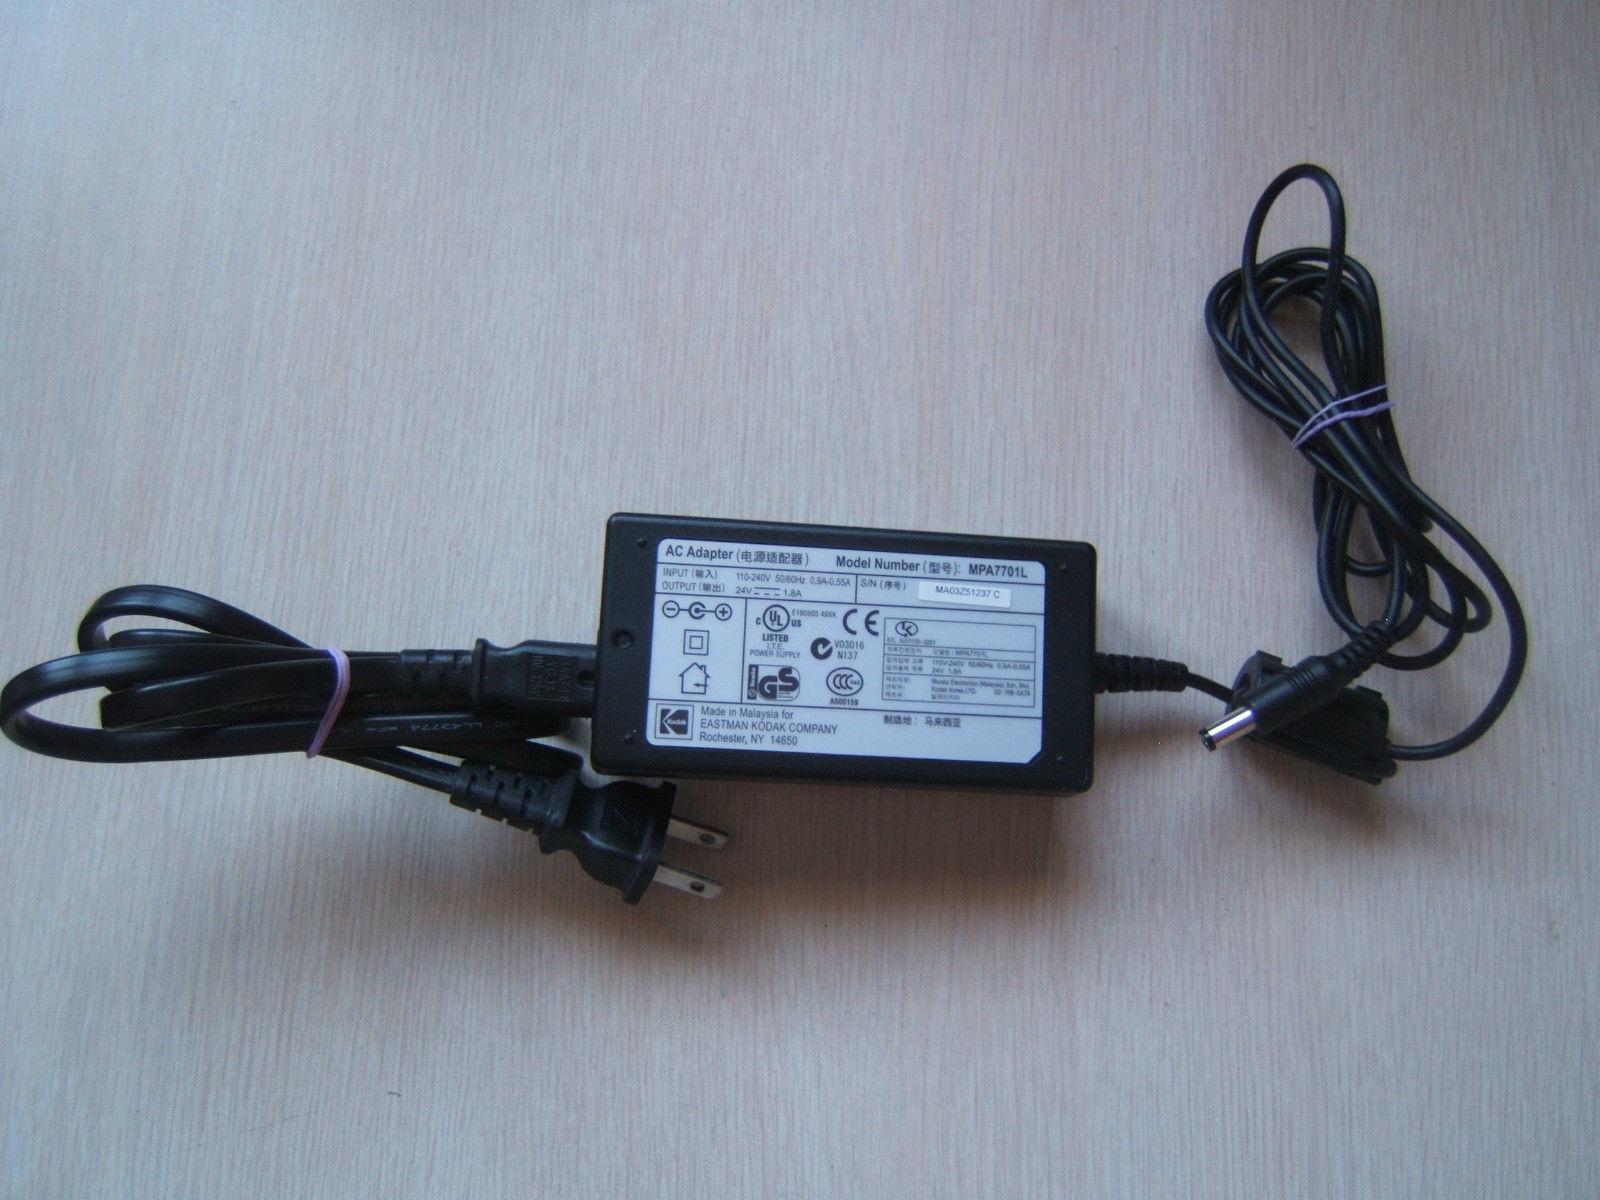 Genuine Kodak EasyShare 4000 AC Adapter Power Supply Cable Cord Brick MPA7701L - $14.59